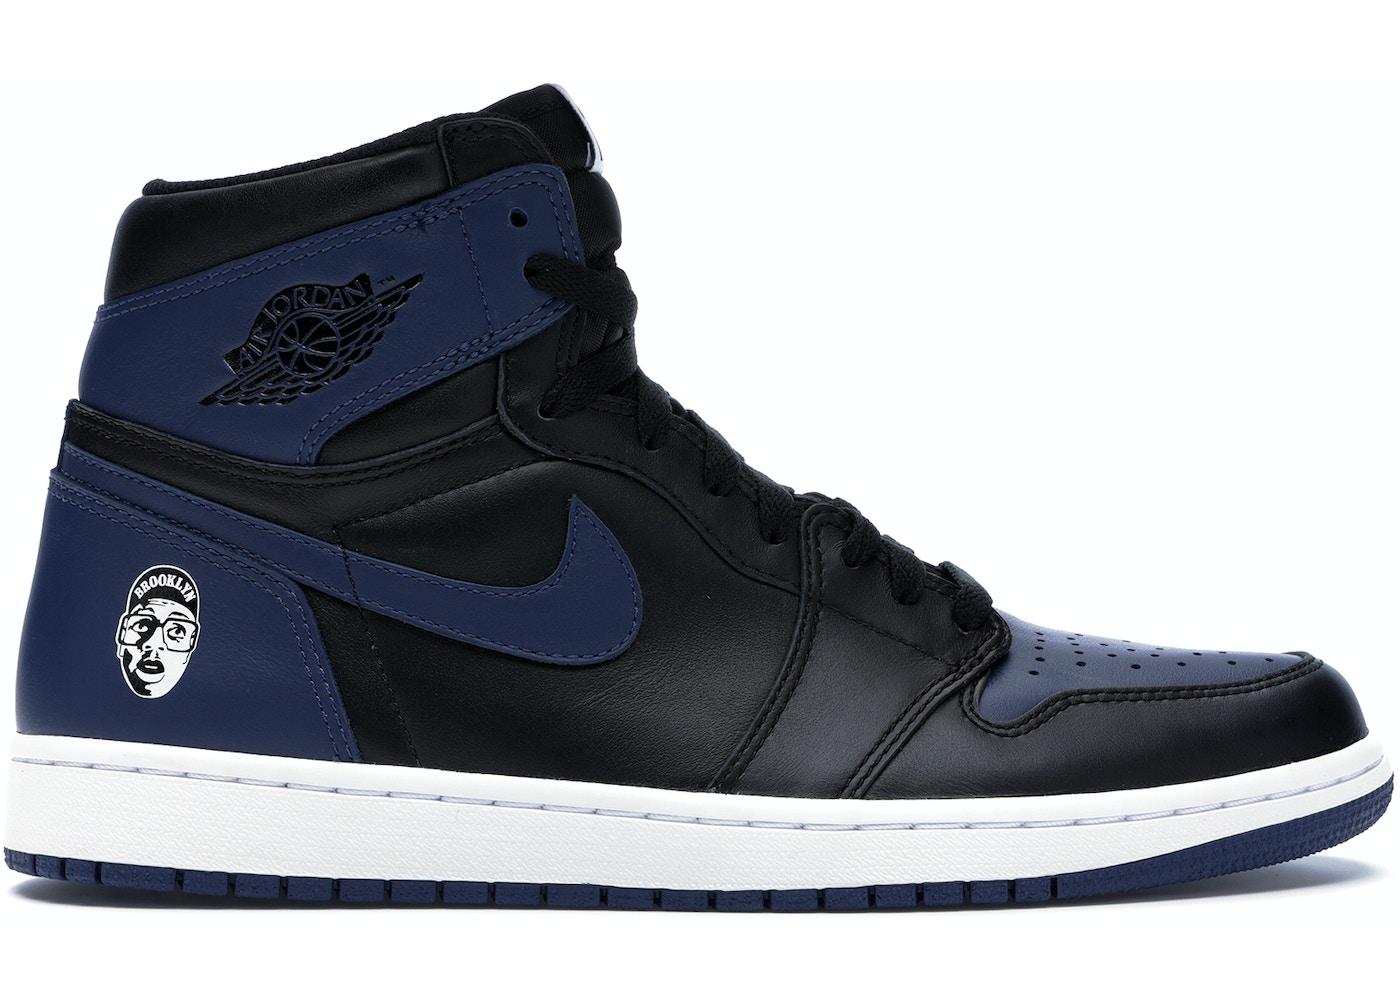 af1b57ff54a6fd Air Jordan Other Shoes - Highest Bid